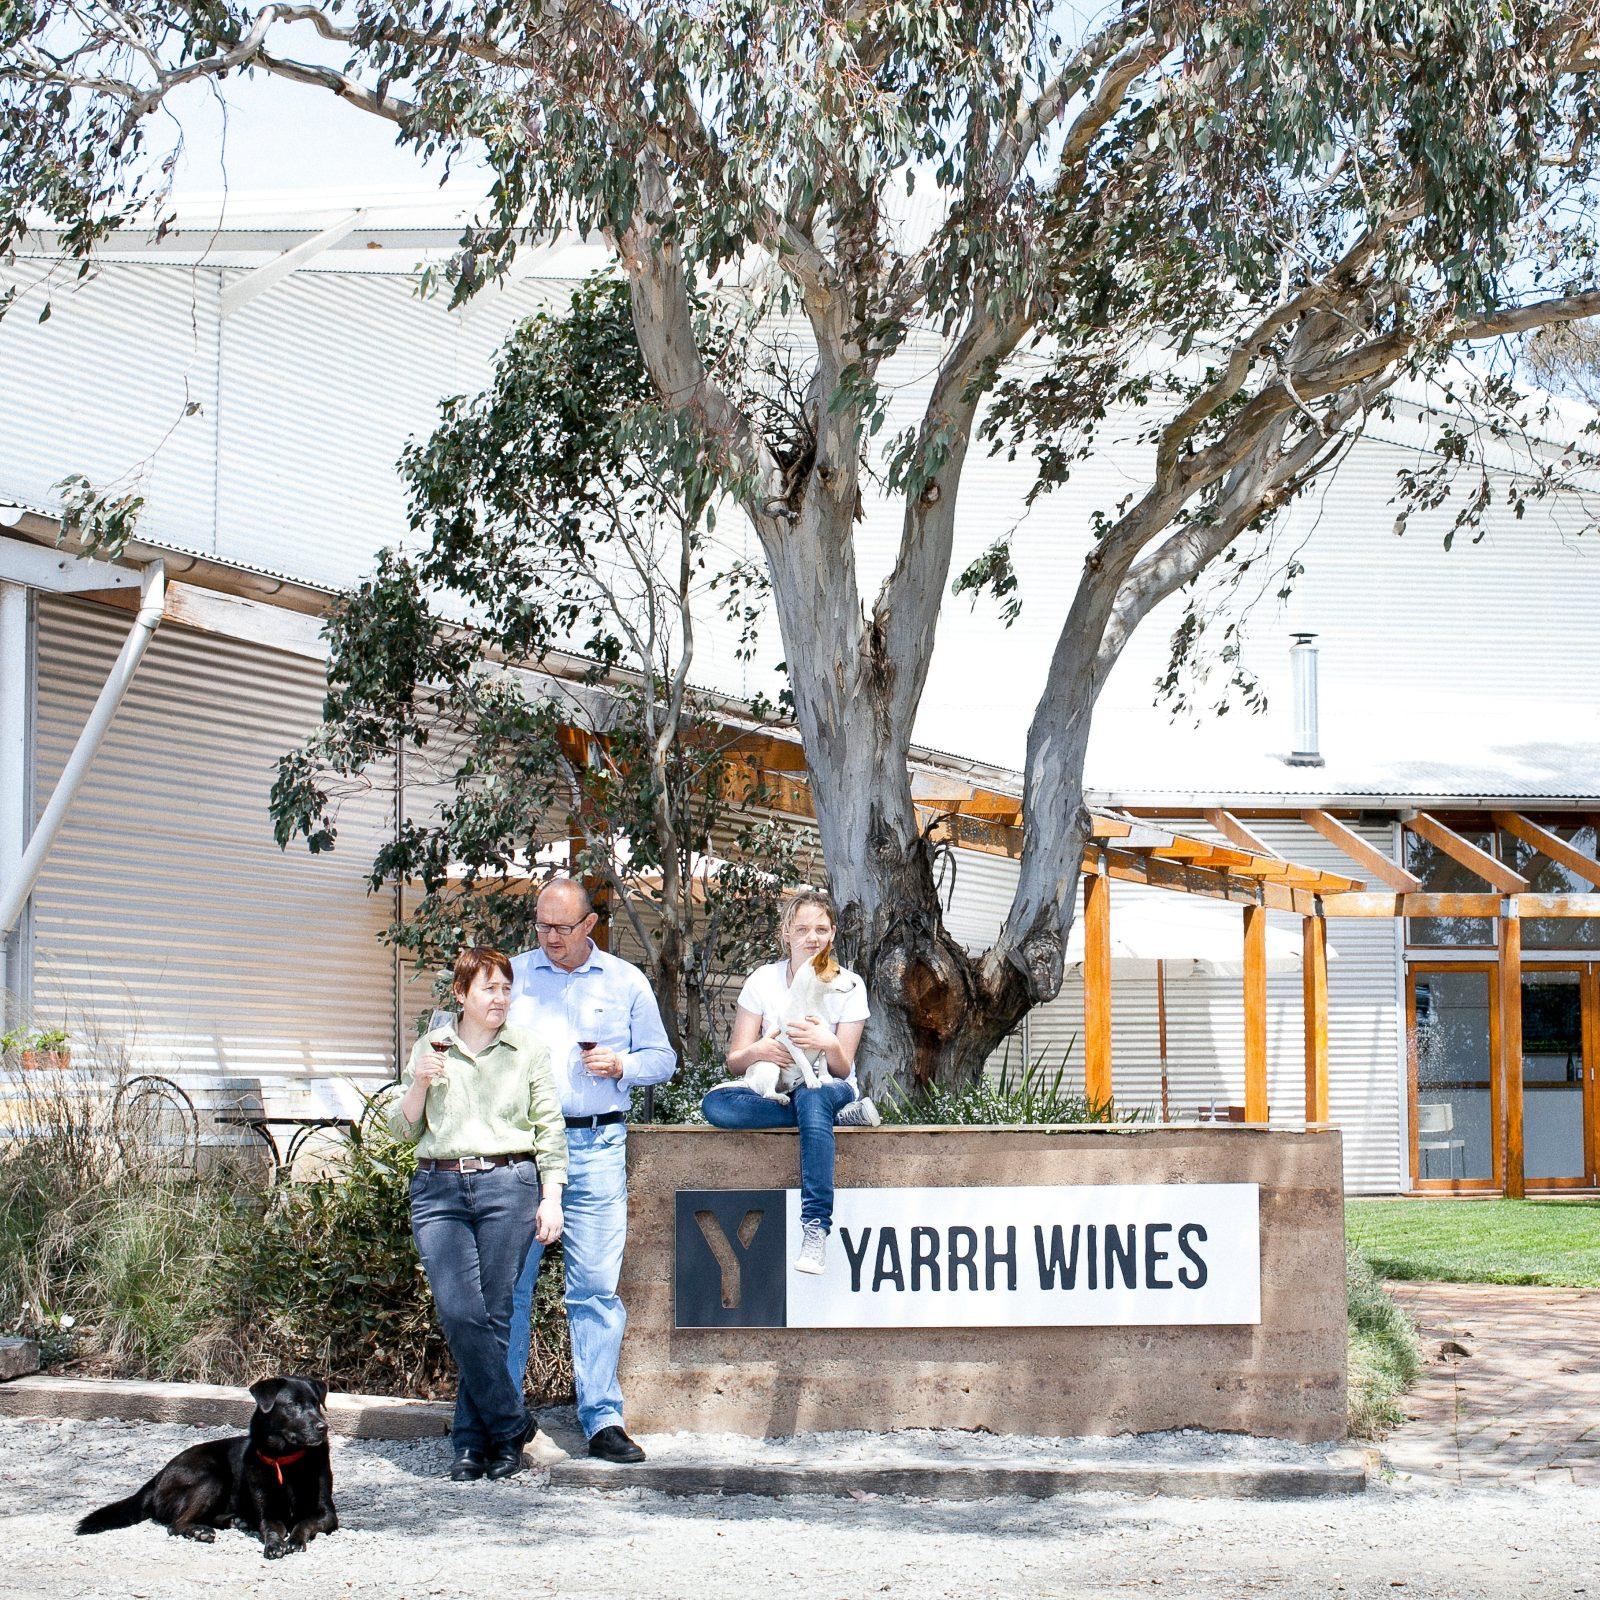 Yarrh Wines